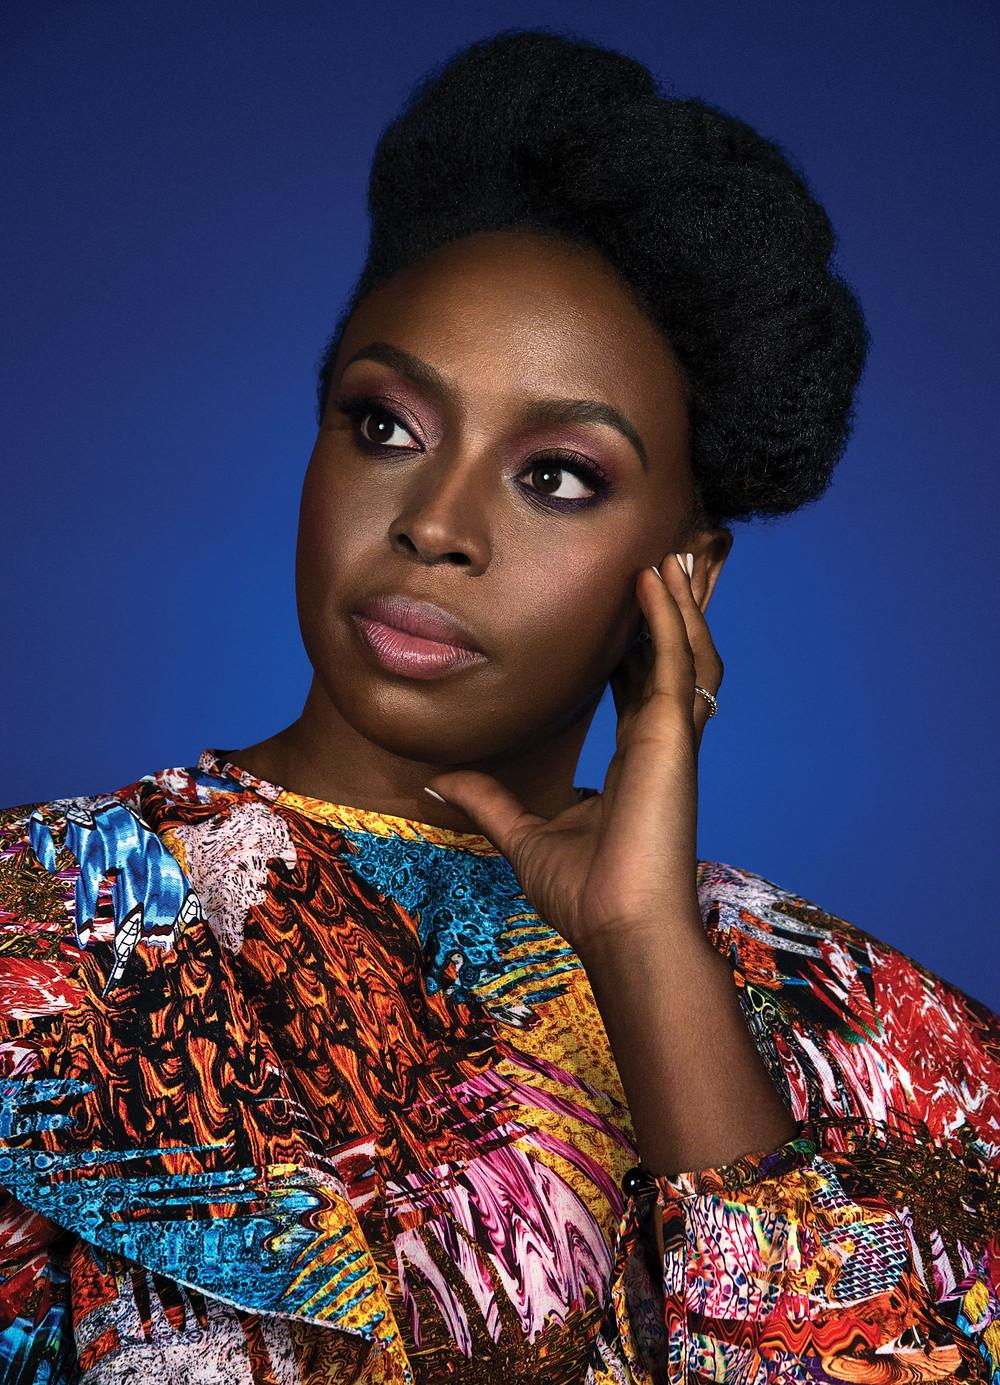 A vibrant image of Adichie